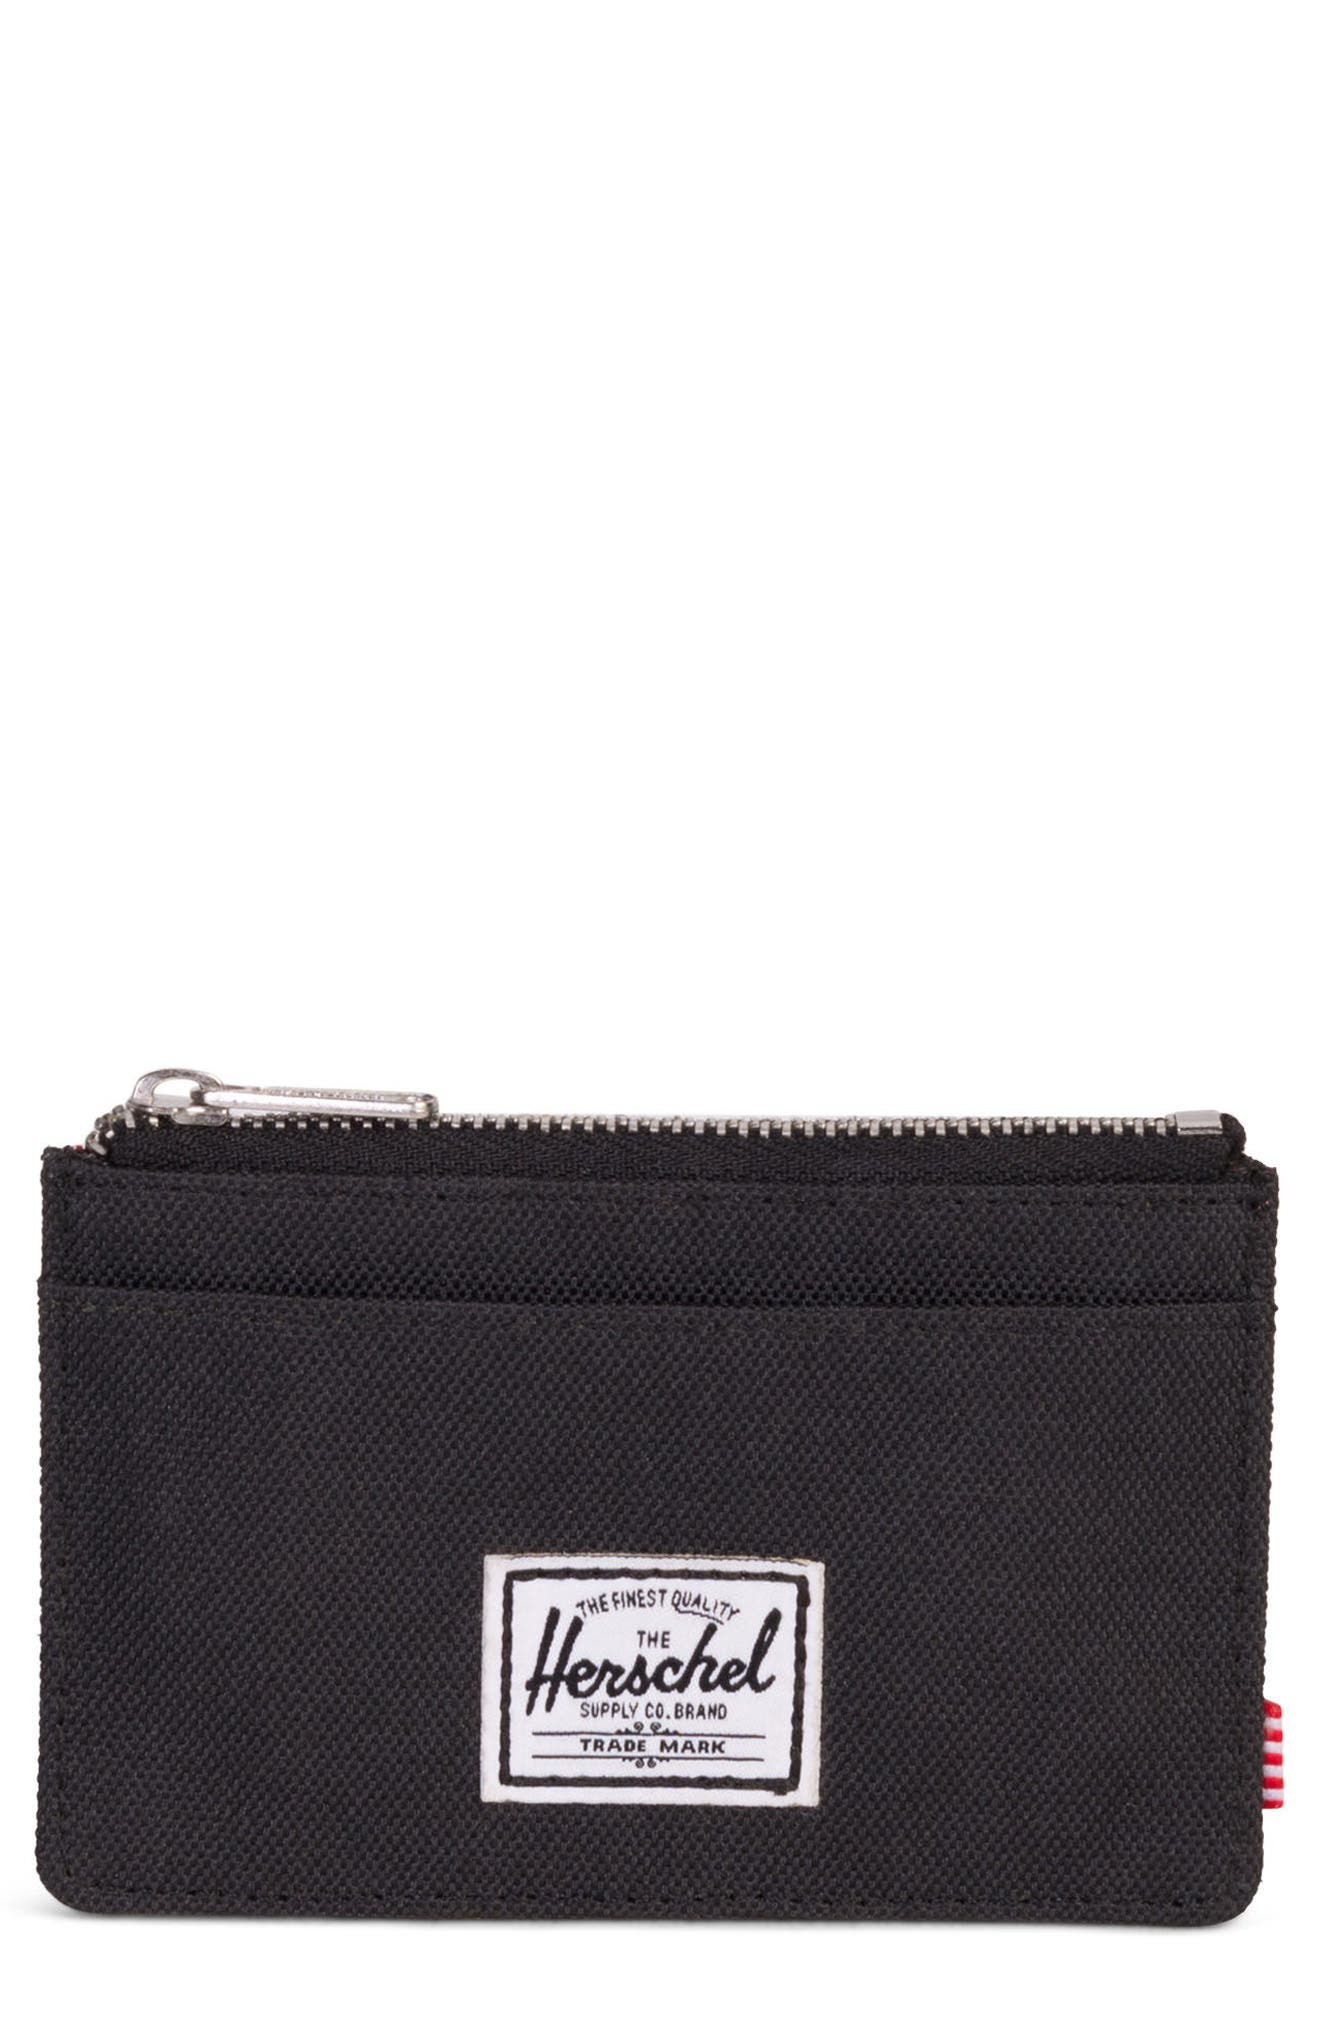 HERSCHEL SUPPLY CO. Oscar Card Case, Main, color, BLACK